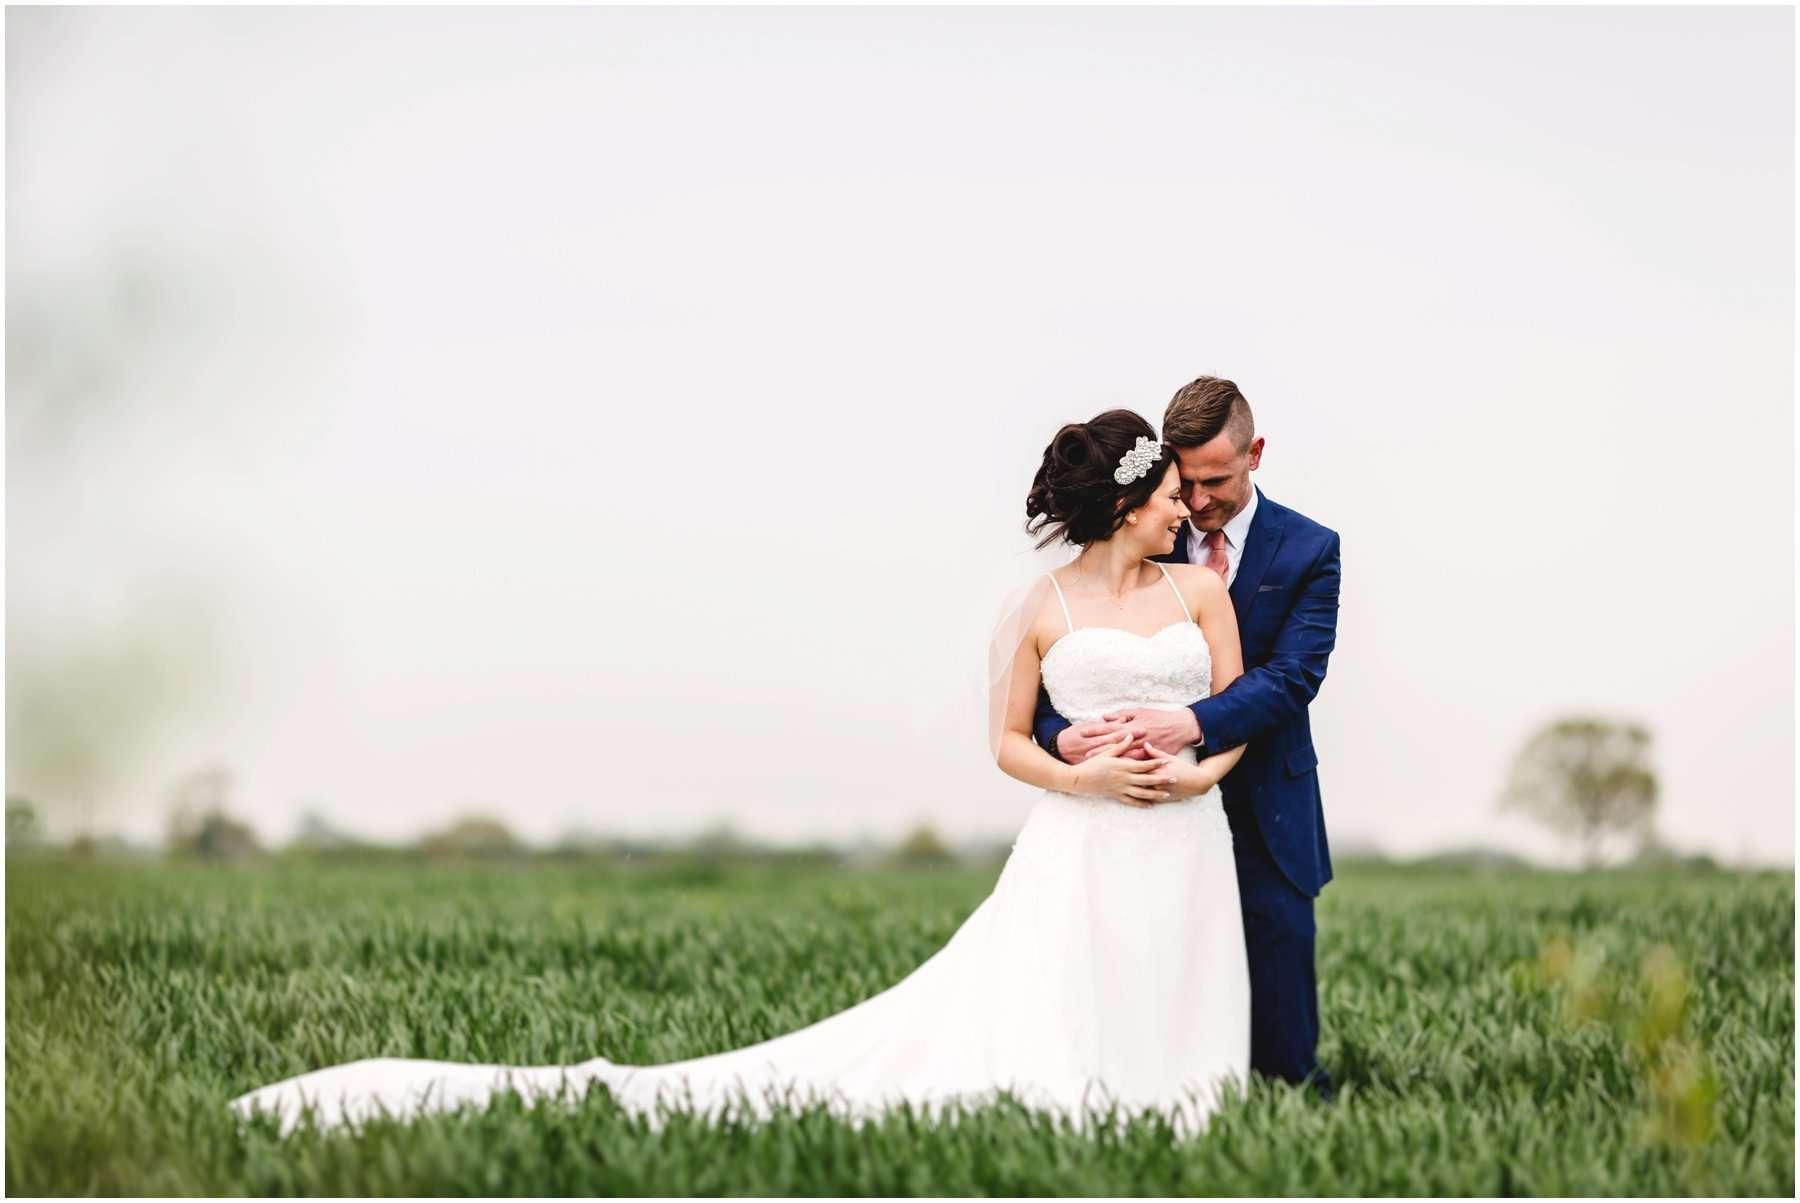 SOUTHWOOD HALL WEDDING - TRACEY AND JONATHAN - NORFOLK WEDDING PHOTOGRAPHER 1